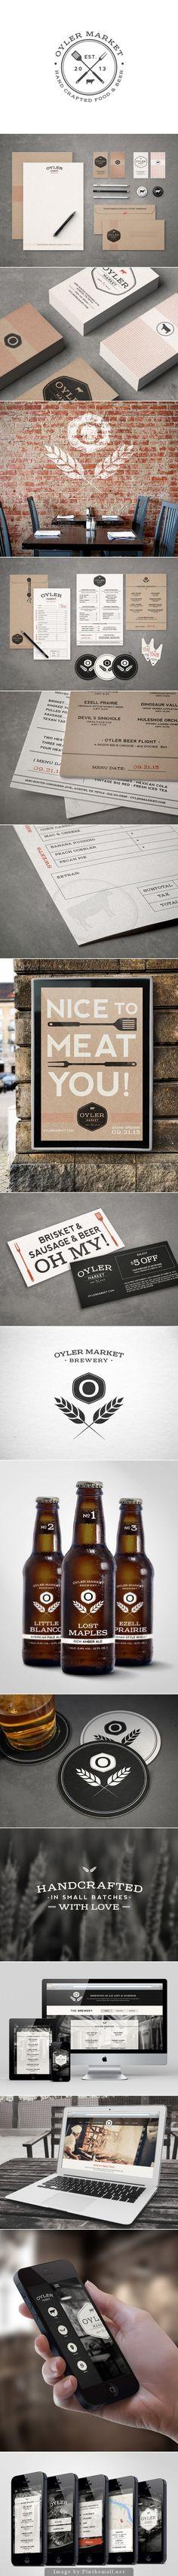 Lunchtime at Oyler Market #identity #packaging #branding